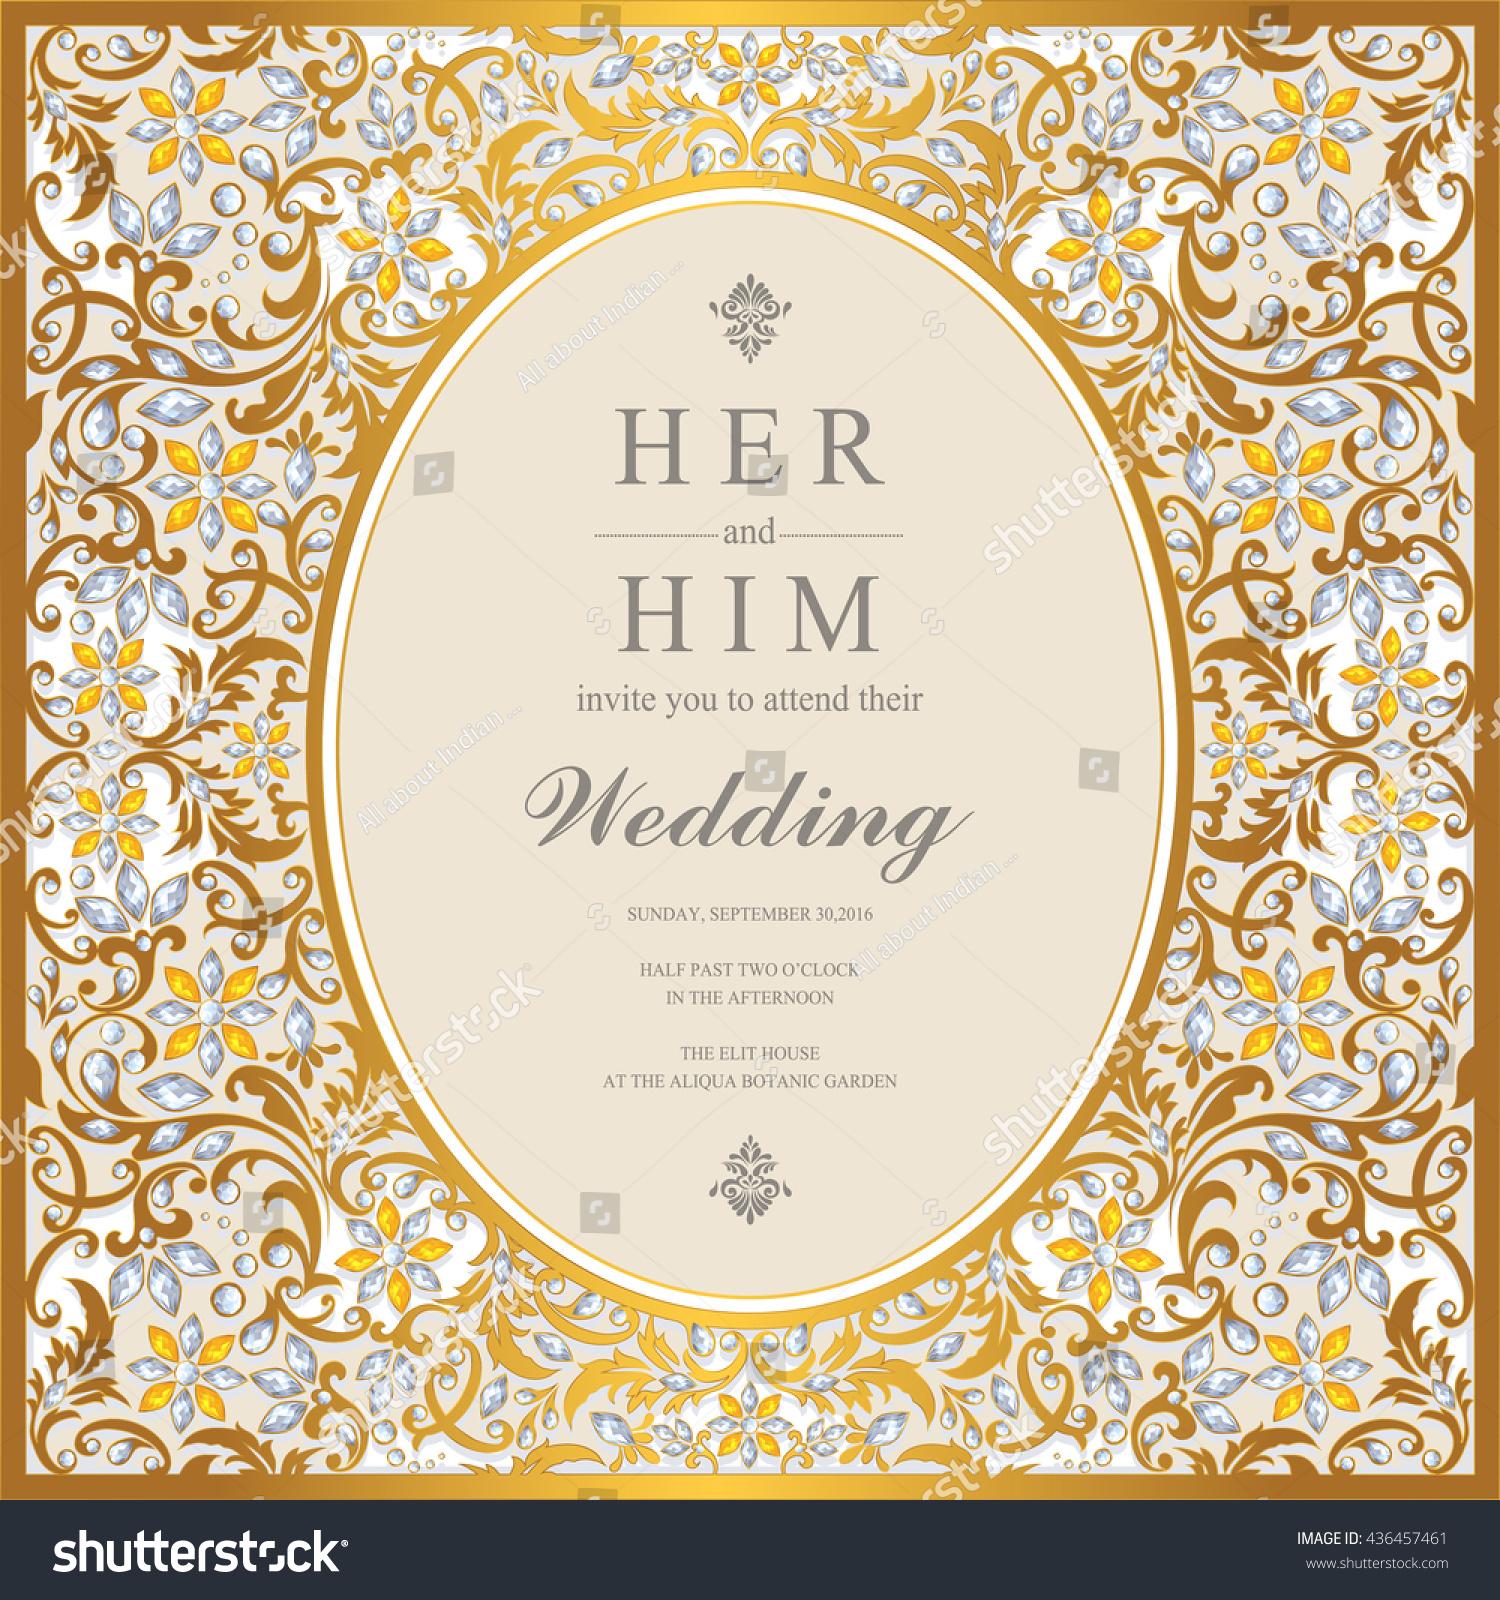 Wedding Card Invitation Card Card Abstract Stock Vector 436457461 ...